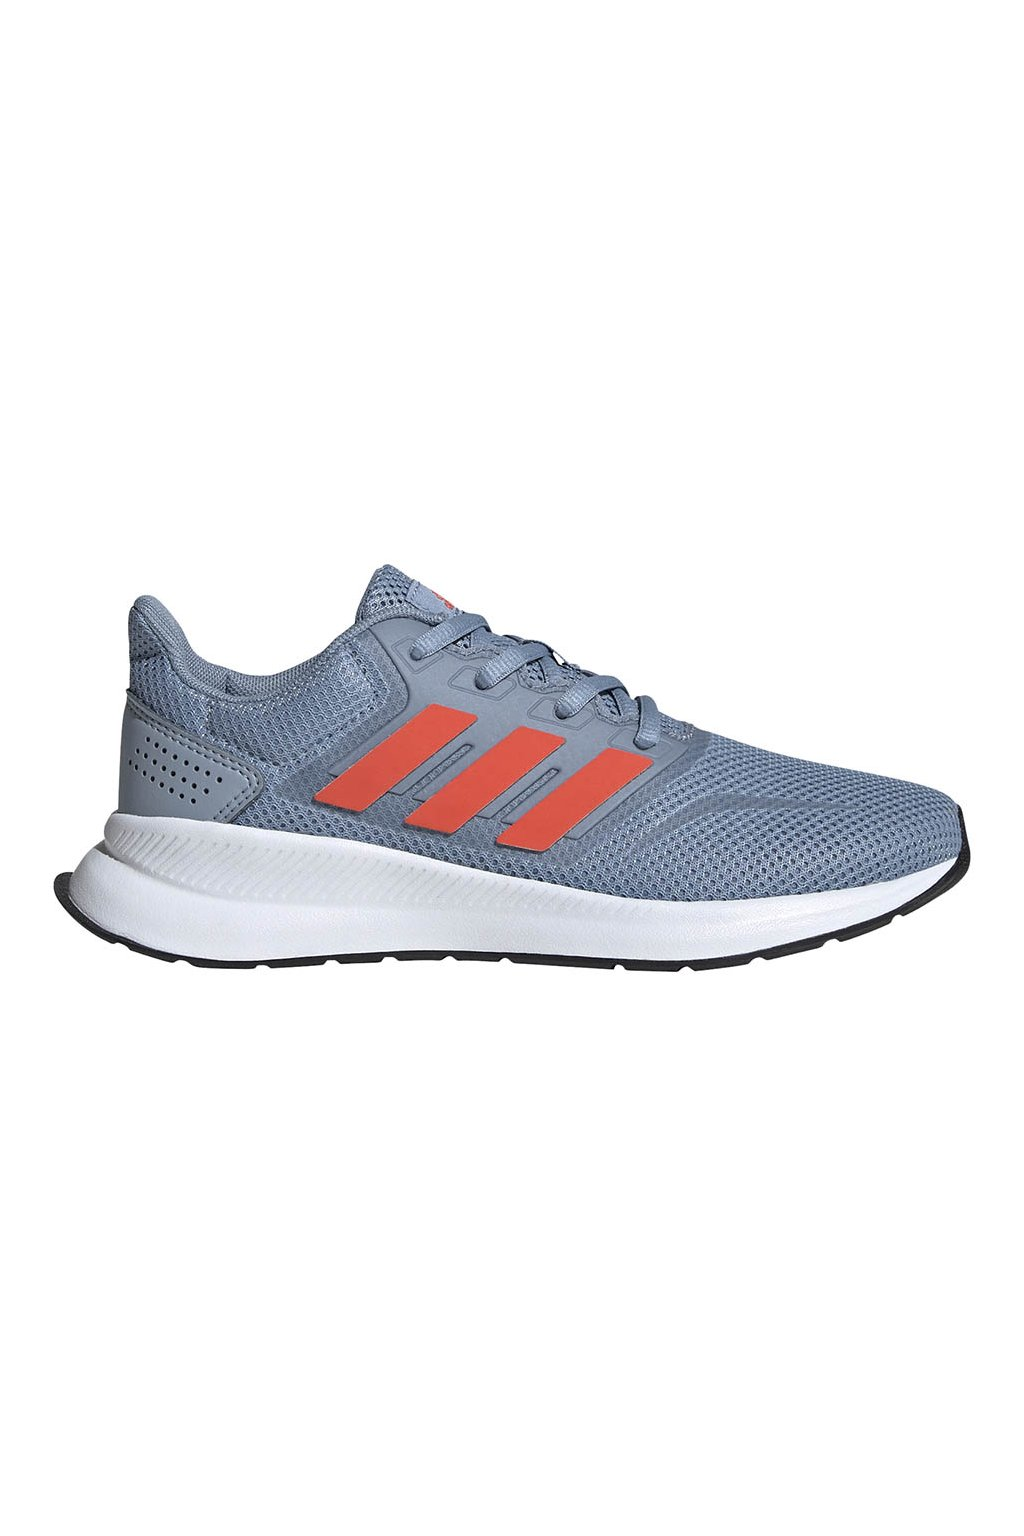 Detská obuv Adidas Runfalcon K šedo-oranžová FV9440